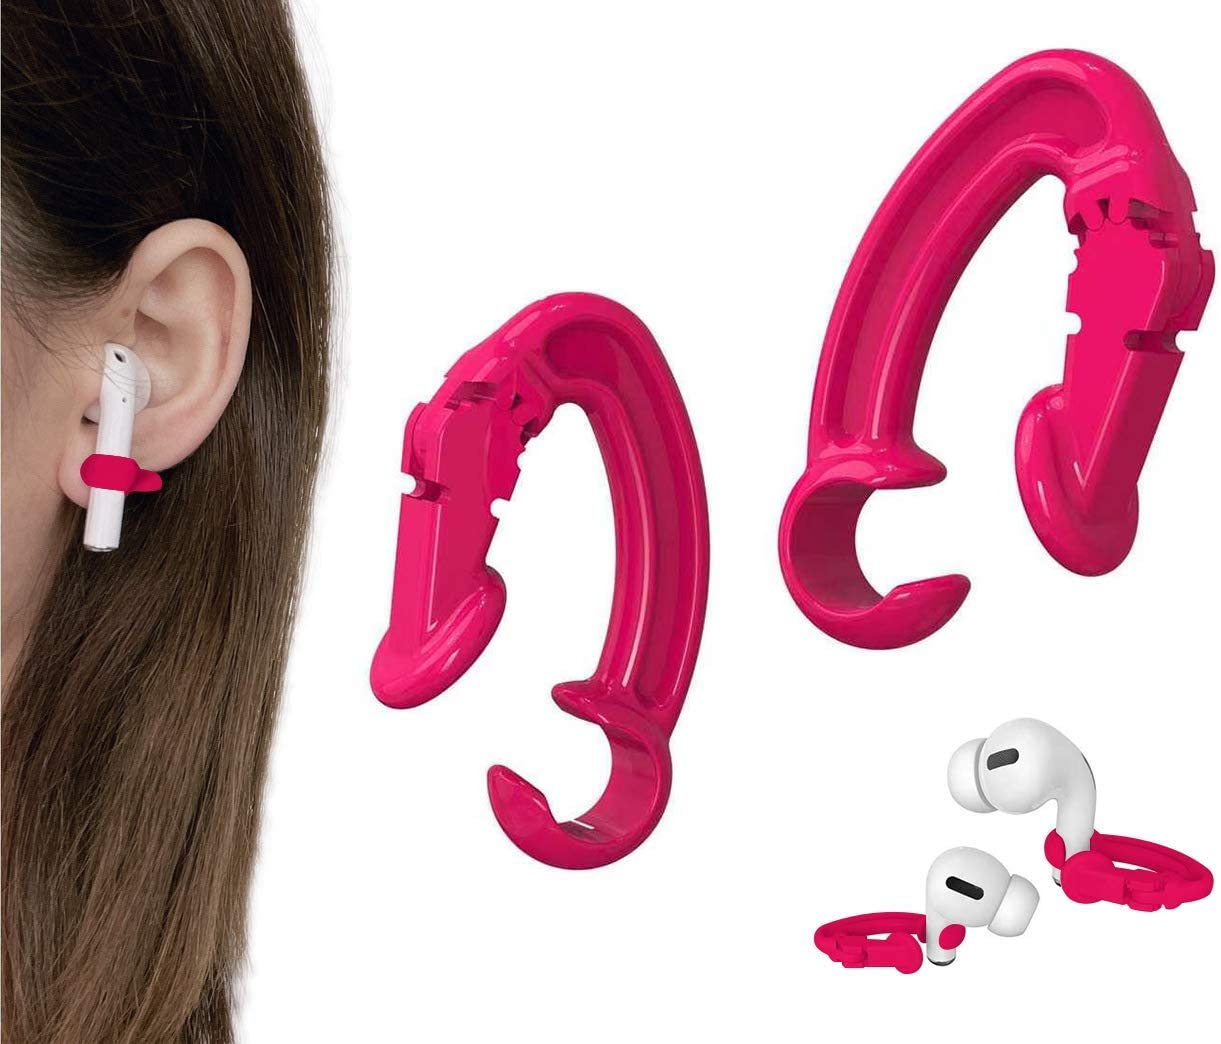 KKPOT 2 Pair Earpods Anti-Lost Ear Hook - Anti-Drop Sports Ear Clip,Wireless Earphones Grip Accessories Tips Compatible with Apple Airpods 1/2/Pro Or Earpods Headphones/Earphones/Earbuds (Red)